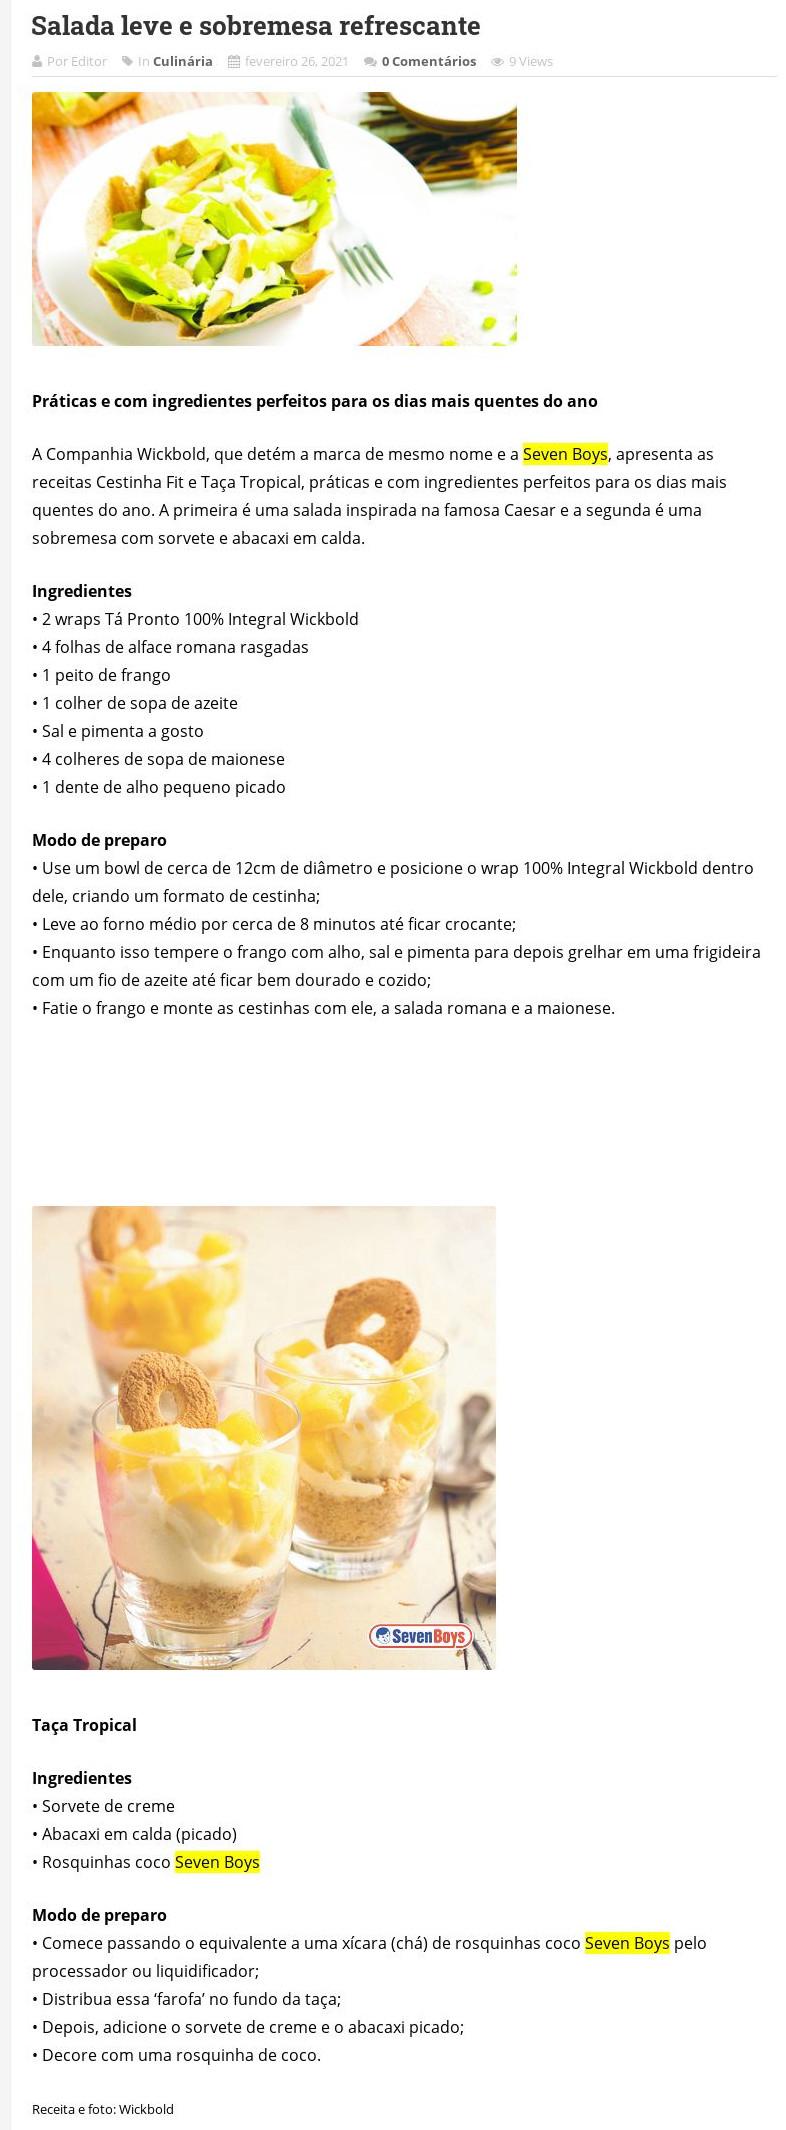 Salada leve e sobremesa refrescante - Jornal Nova Metropolí